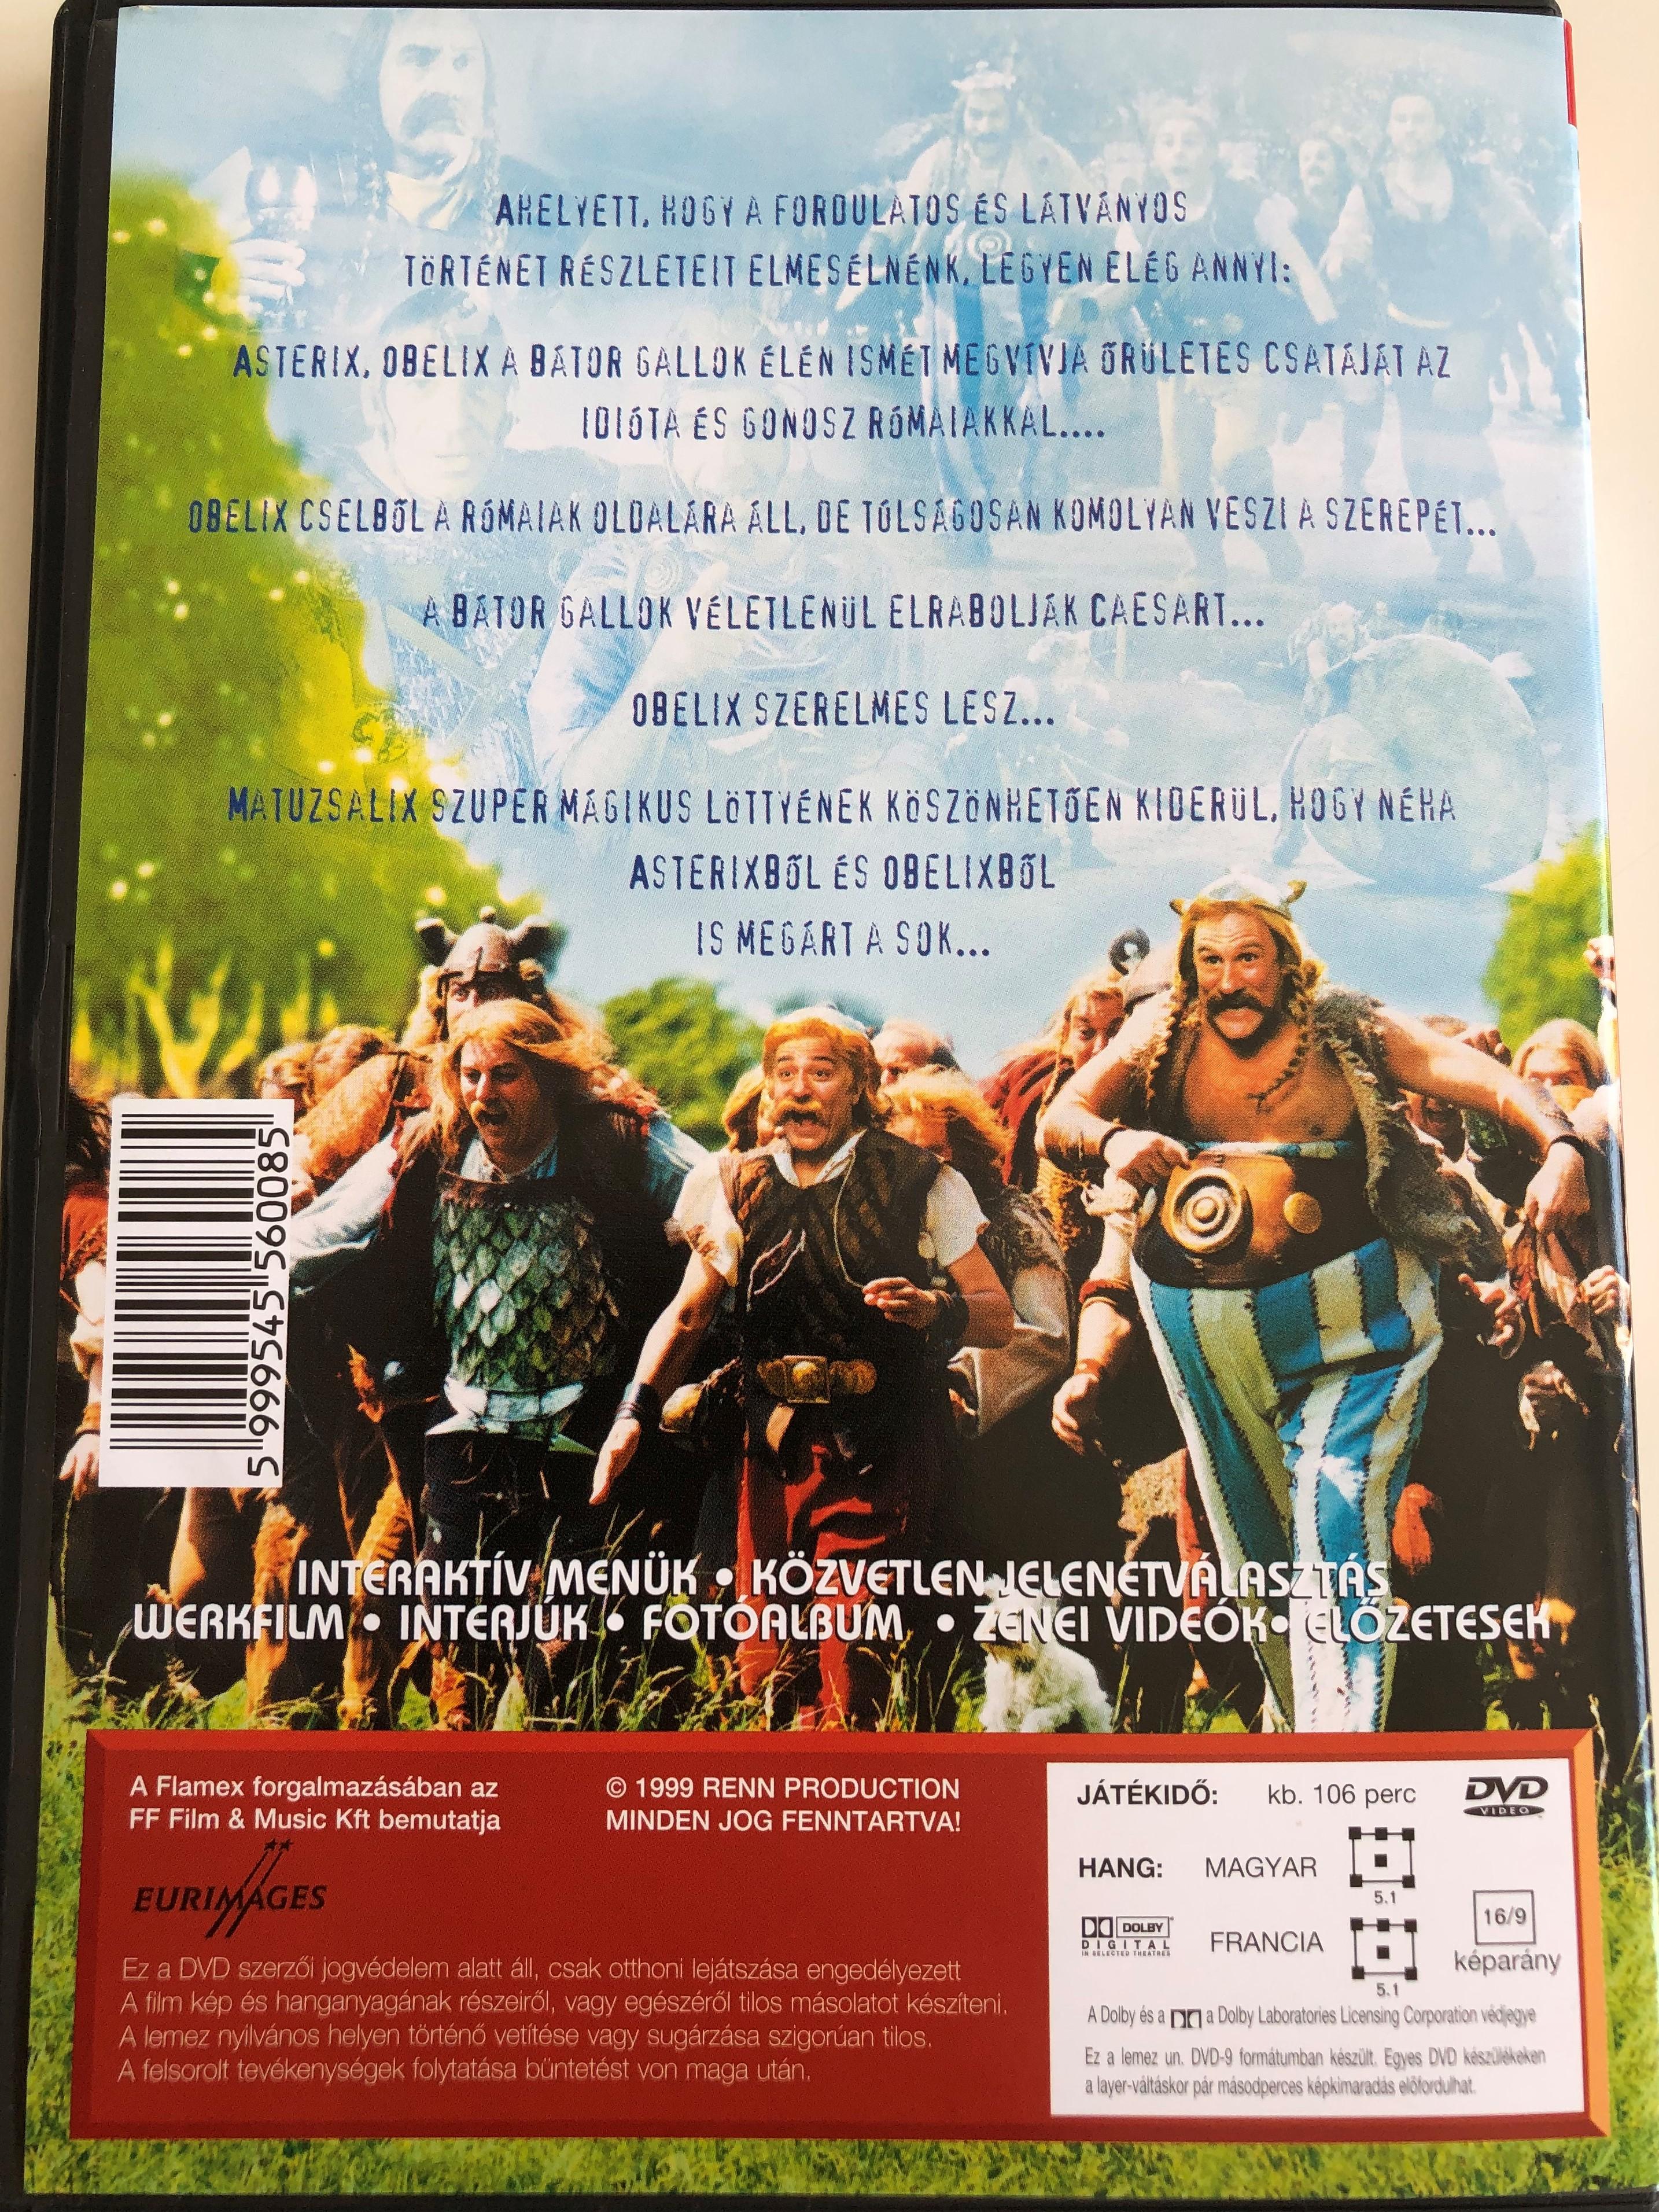 asterix-et-obelix-dvd-1999-asterix-s-obelix-directed-by-claude-zidi-starring-christian-clavier-g-rard-depardieu-roberto-benigni-laetitia-casta-2-.jpg